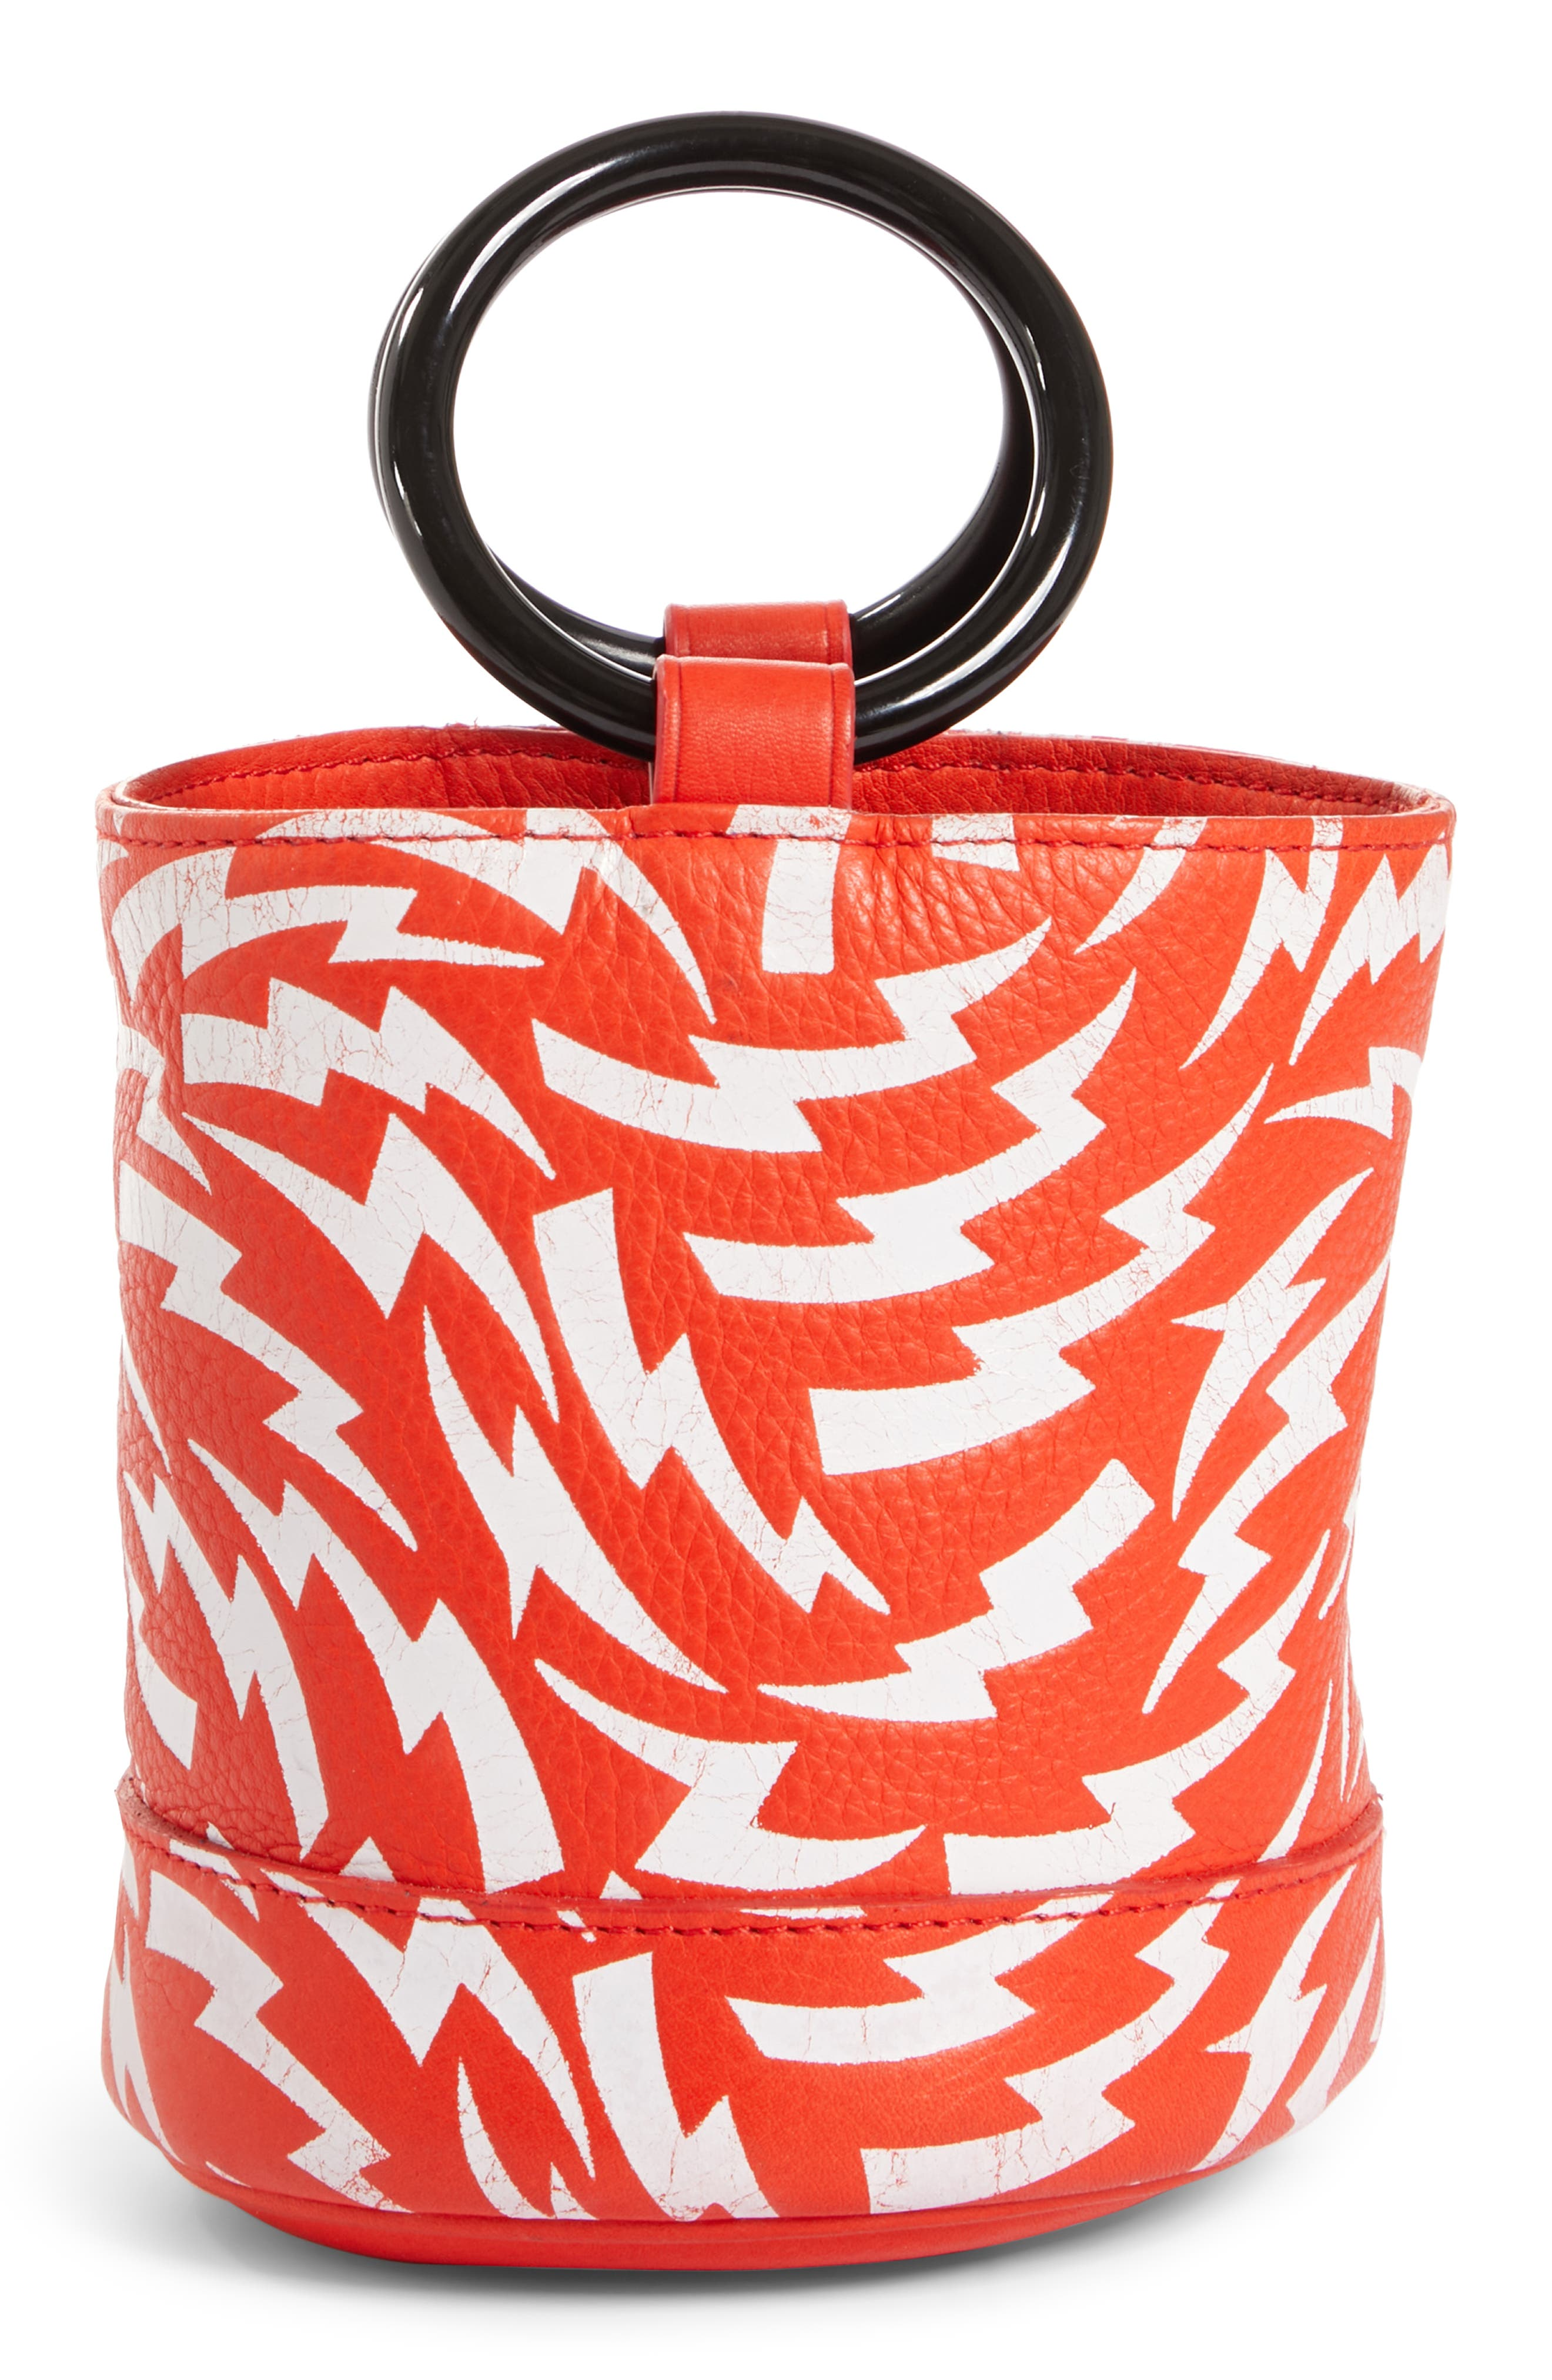 x Paramount Grease Bonsai 15 Lightning Print Bucket Bag,                             Alternate thumbnail 3, color,                             WHITE LIGHTNING BOLT